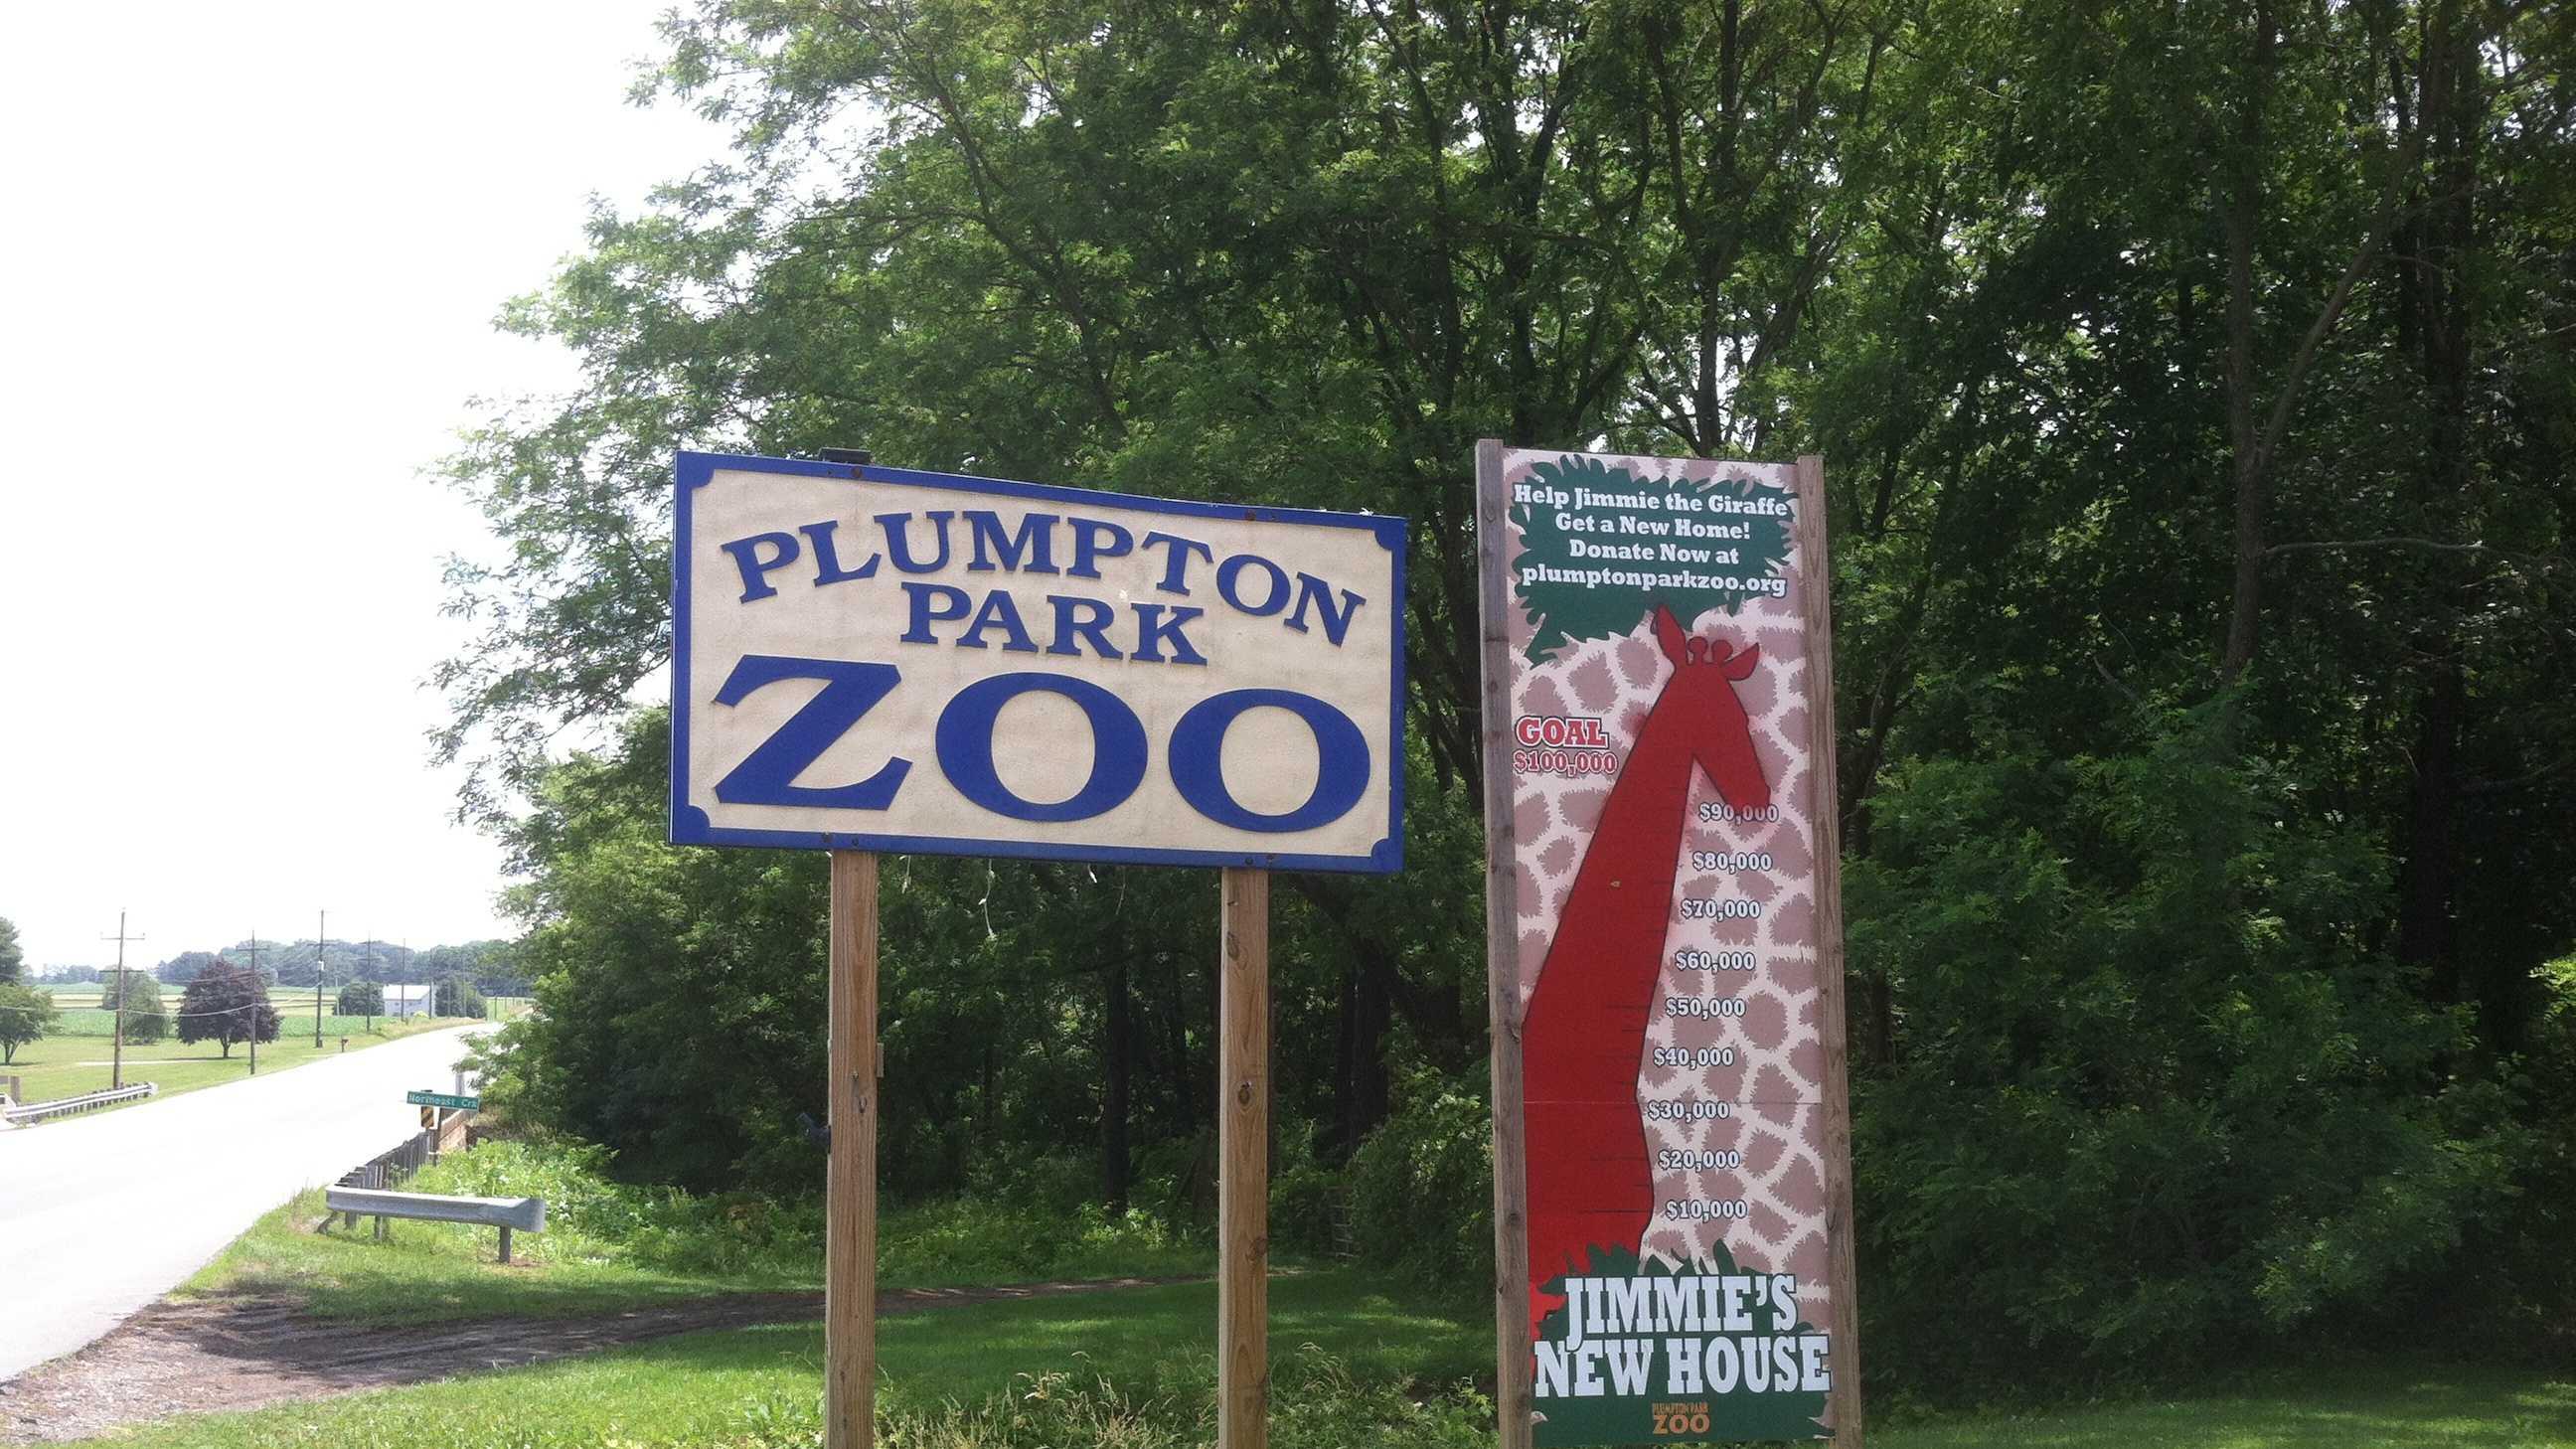 plumpton park.JPG